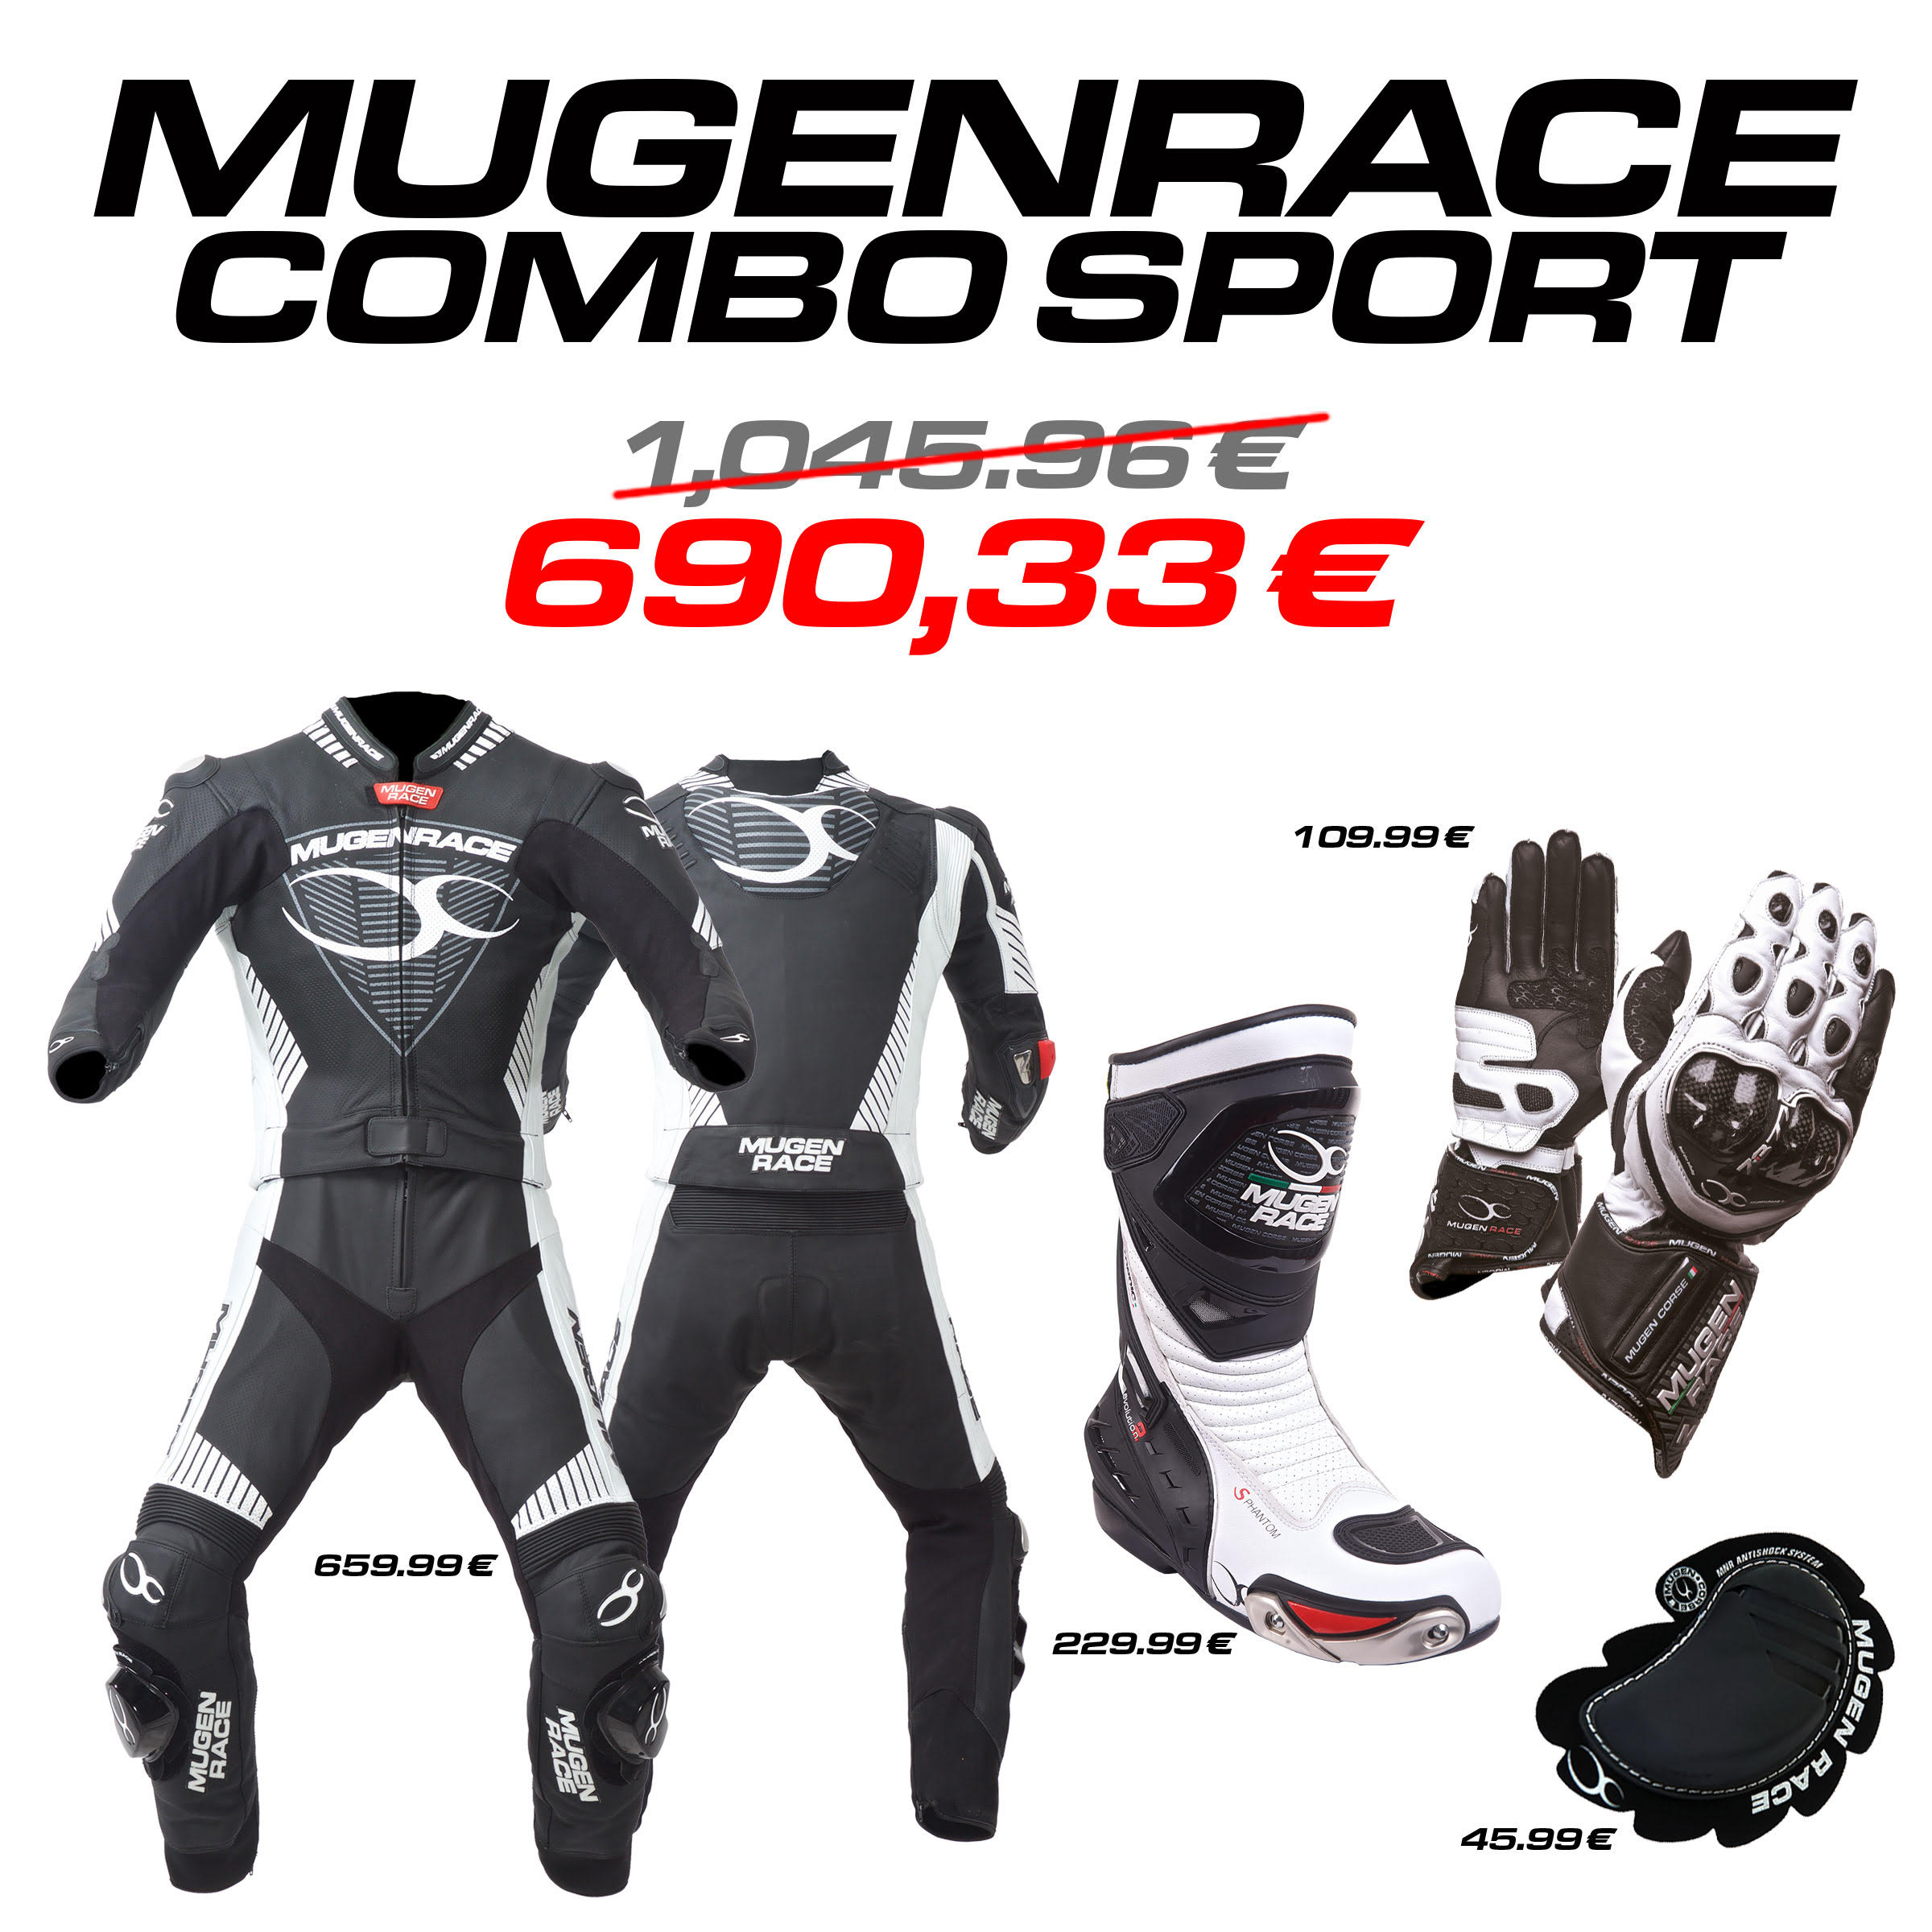 MUGENRACE combo Sport (man)